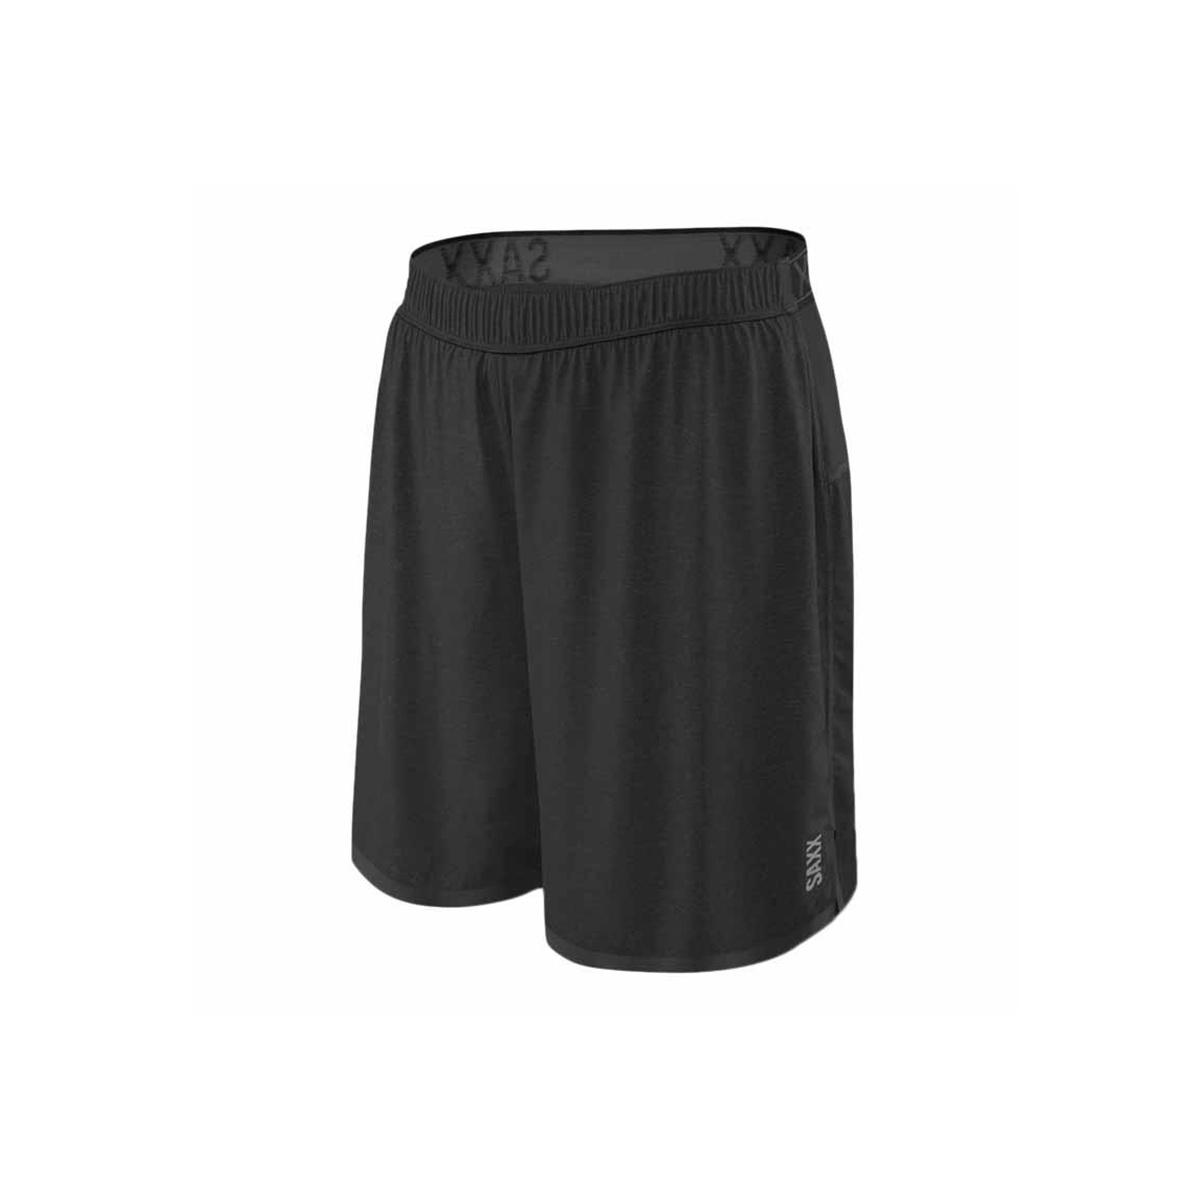 Saxx Underwear Co. Men's Saxx Pilot 2N1 Shorts